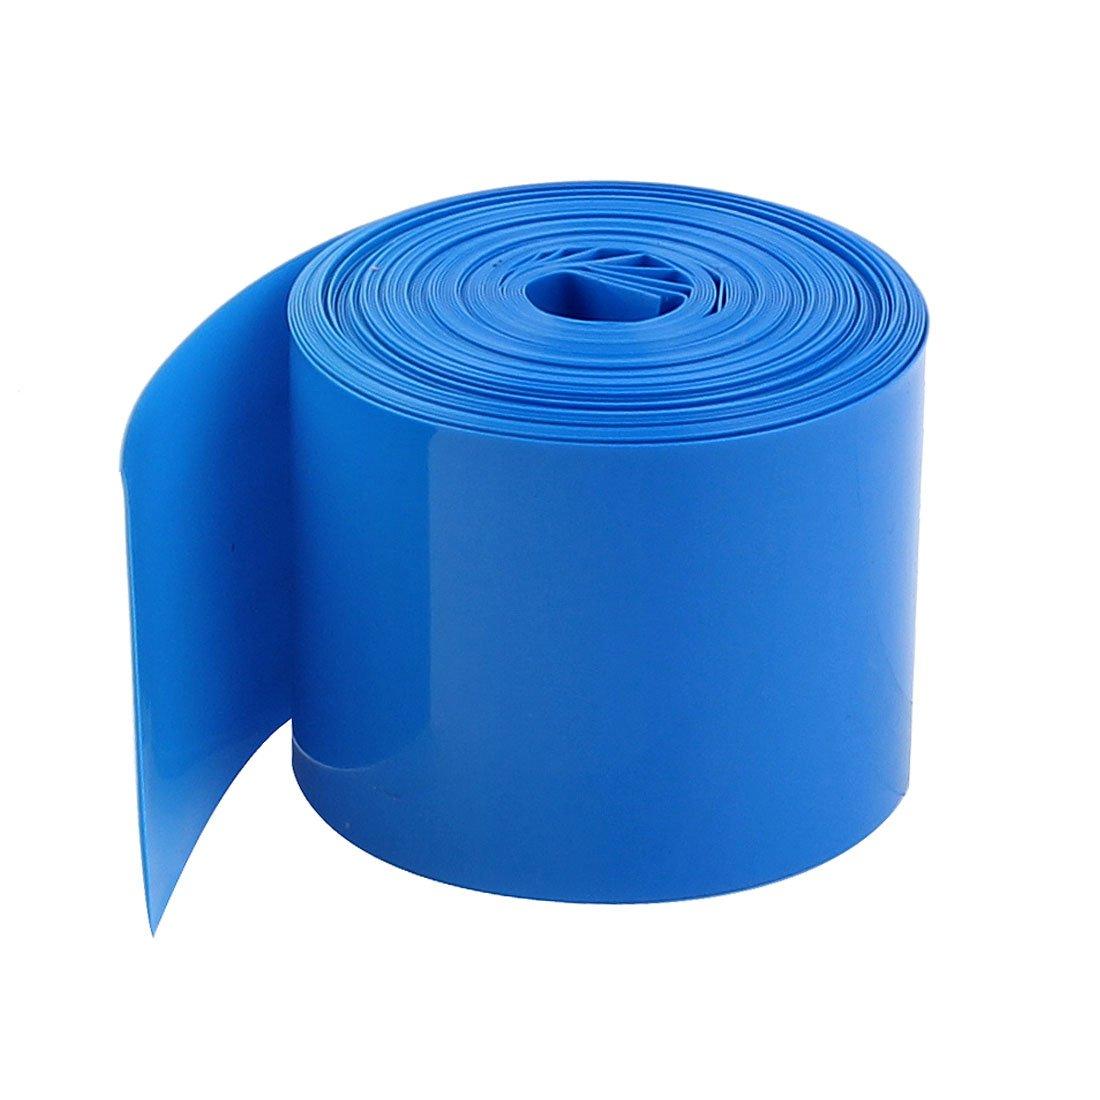 sourcingmap 5Meters 29.5mm Width PVC Heat Shrink Wrap Blue for 1 x 18650 Battery a15012900ux0429